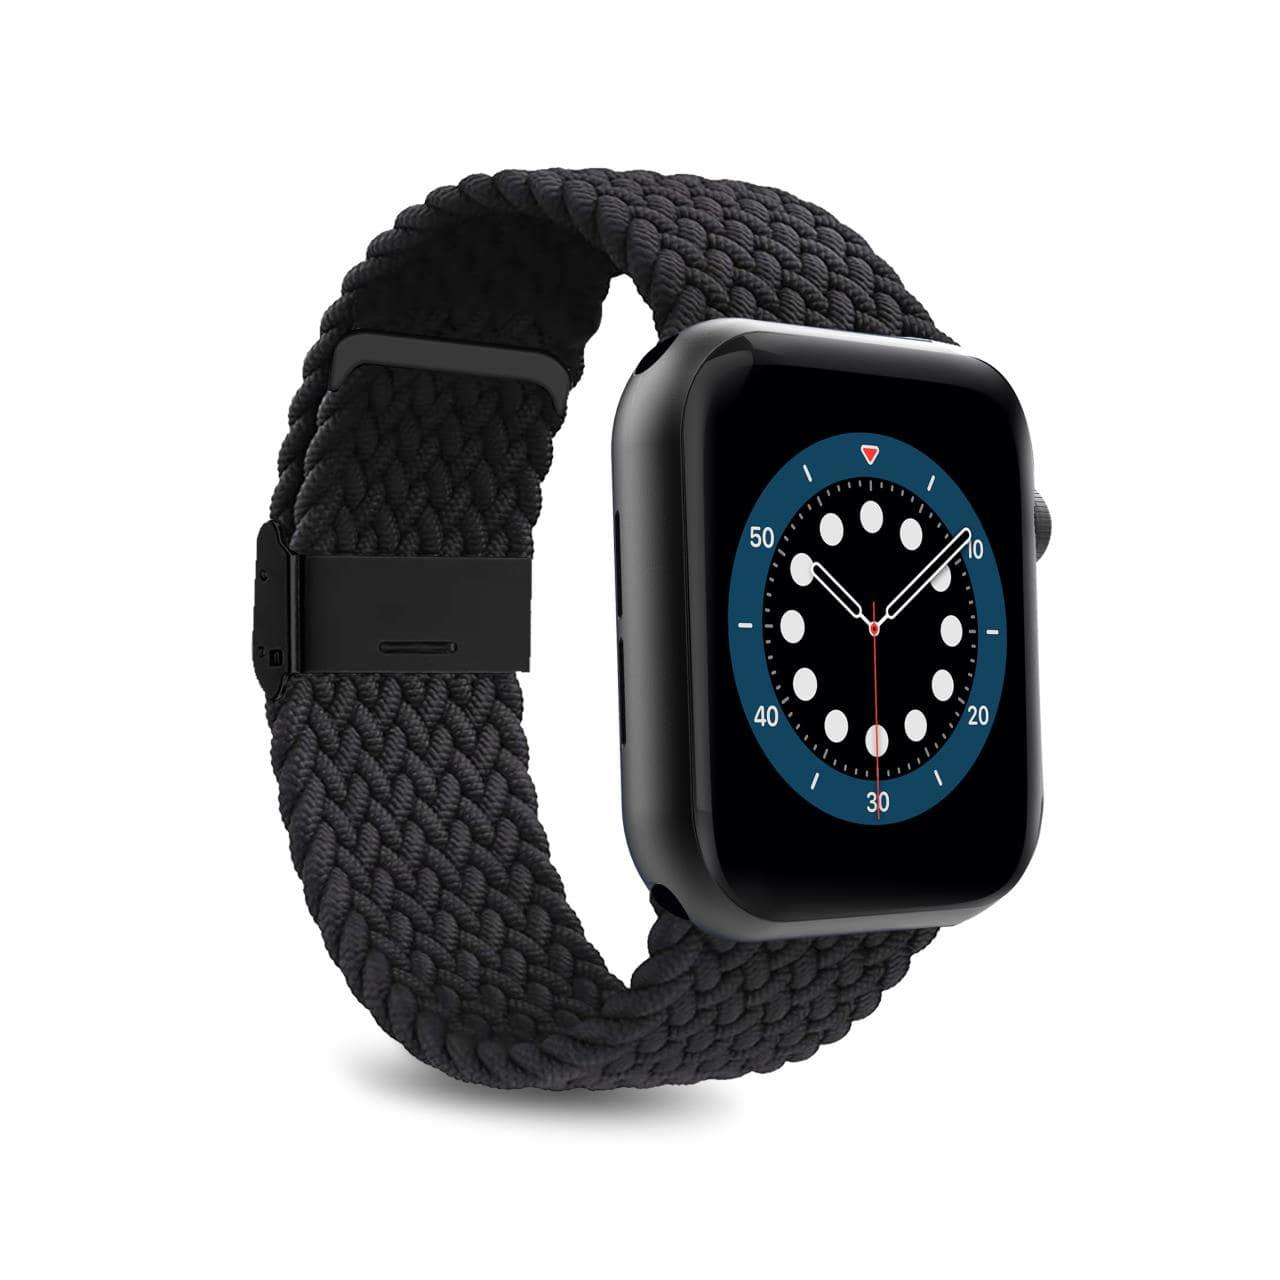 puro-cinturino-loop-per-apple-watch_01-min